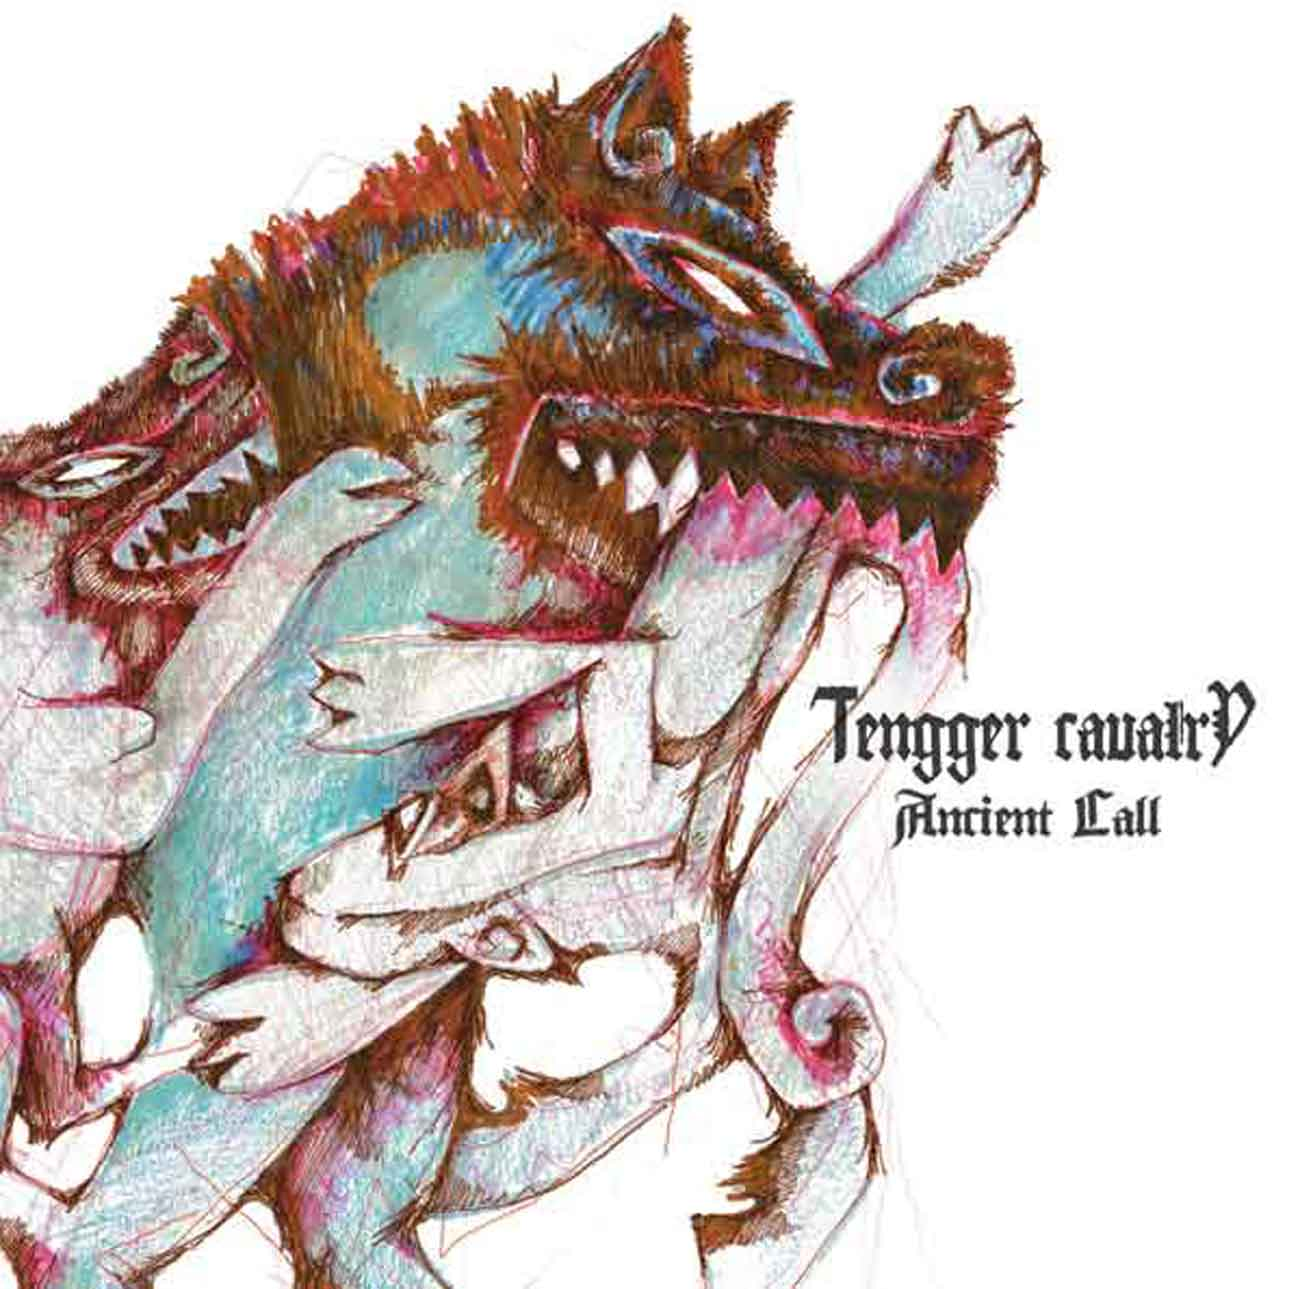 Tengger Cavalry - Ancient Call CD mongolian folk metal